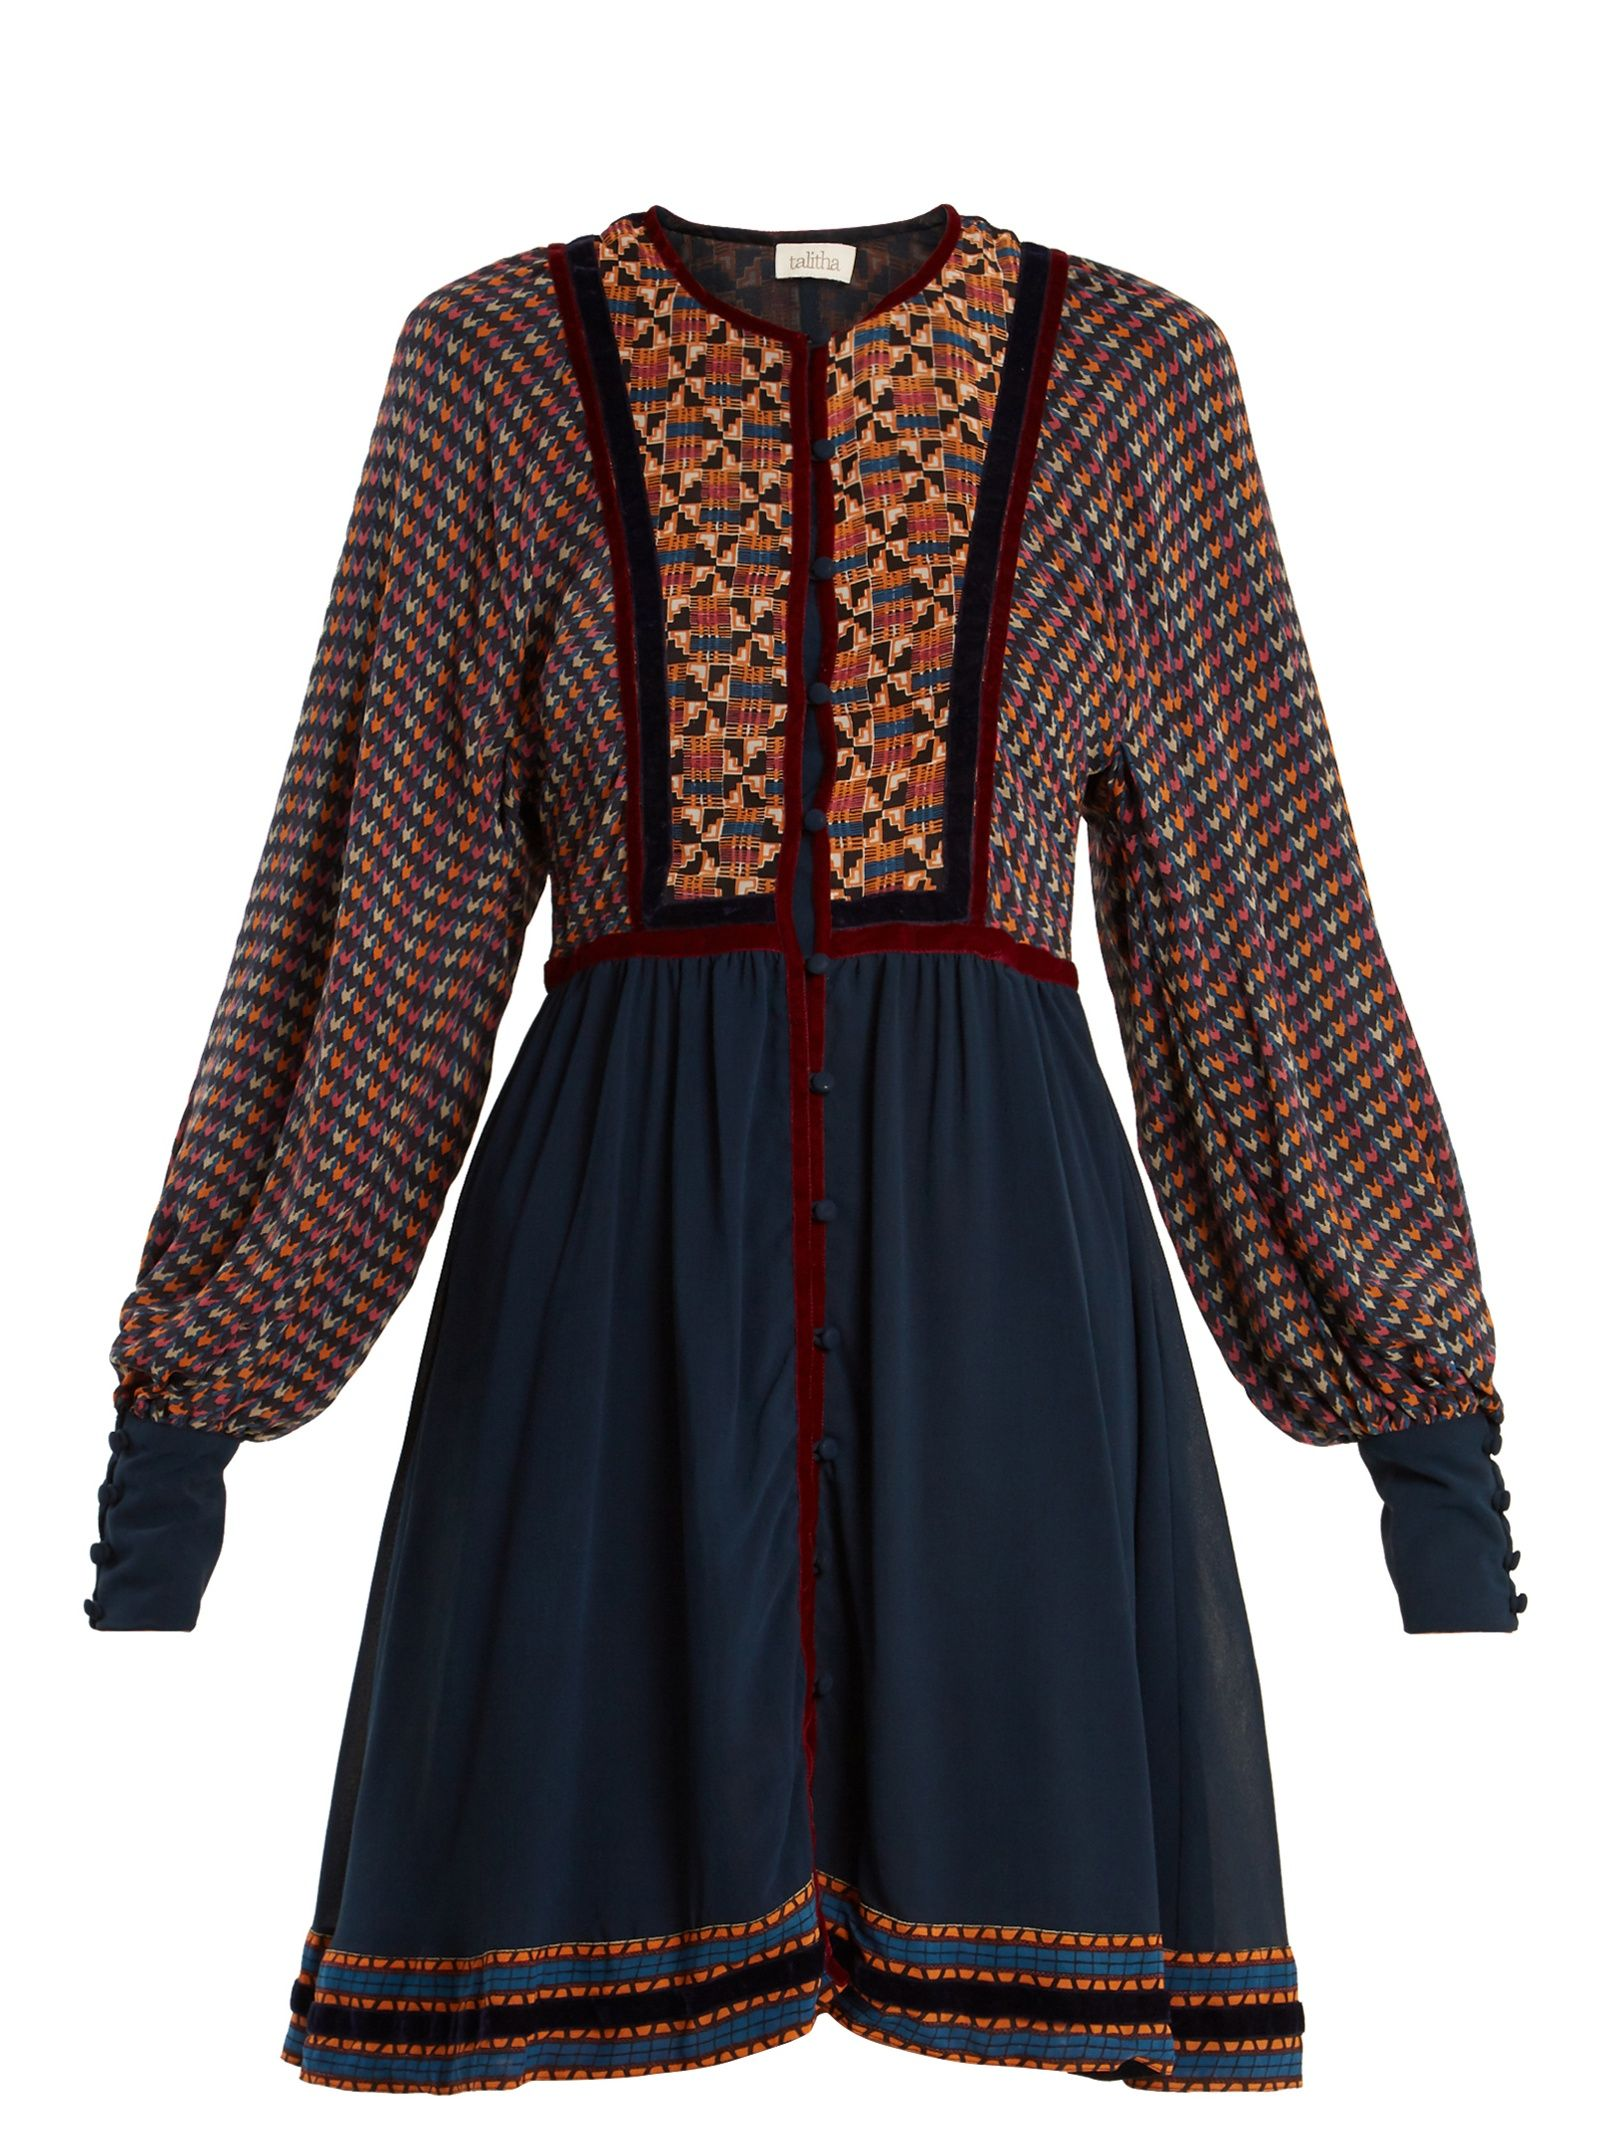 Click here to buy Talitha Athena Ashanti-print silk dress at MATCHESFASHION.COM